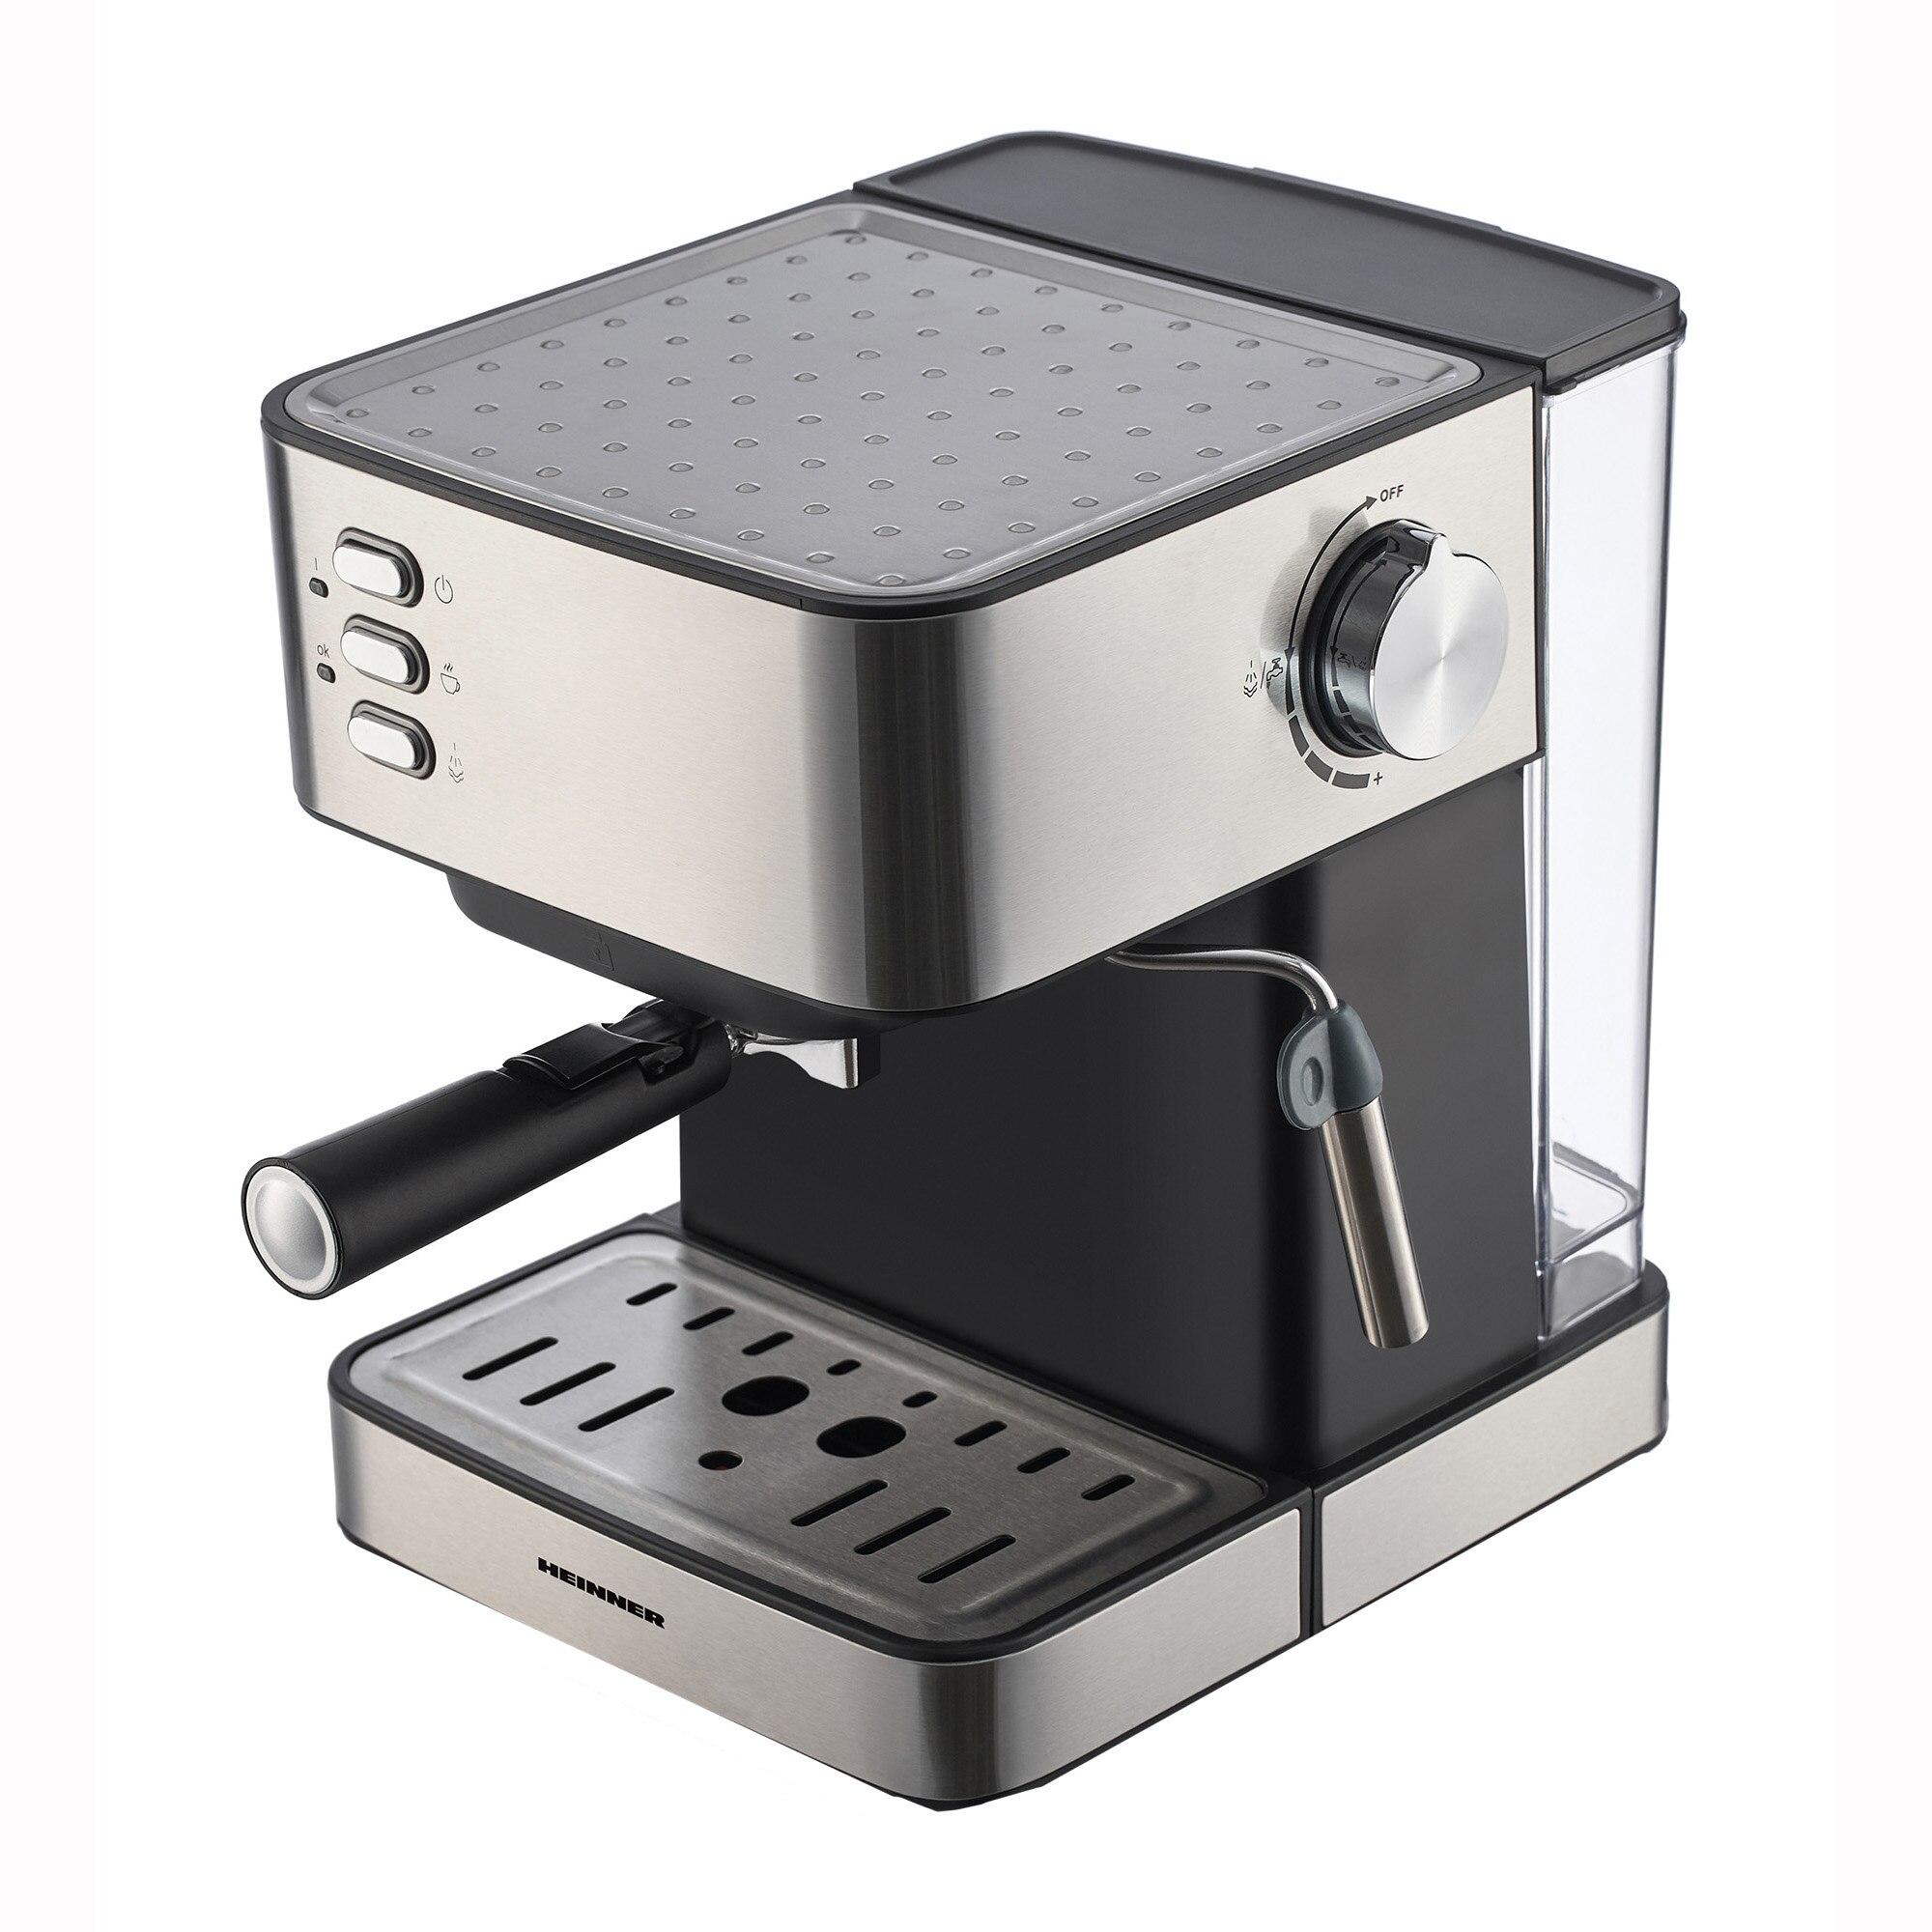 Fotografie Espressor Heinner HEM-B2016BKS, 850W, 20 bar, rezervor apa detasabil 1.6l, filtru din inox, plita mentinere cafea calda, decoratii inox